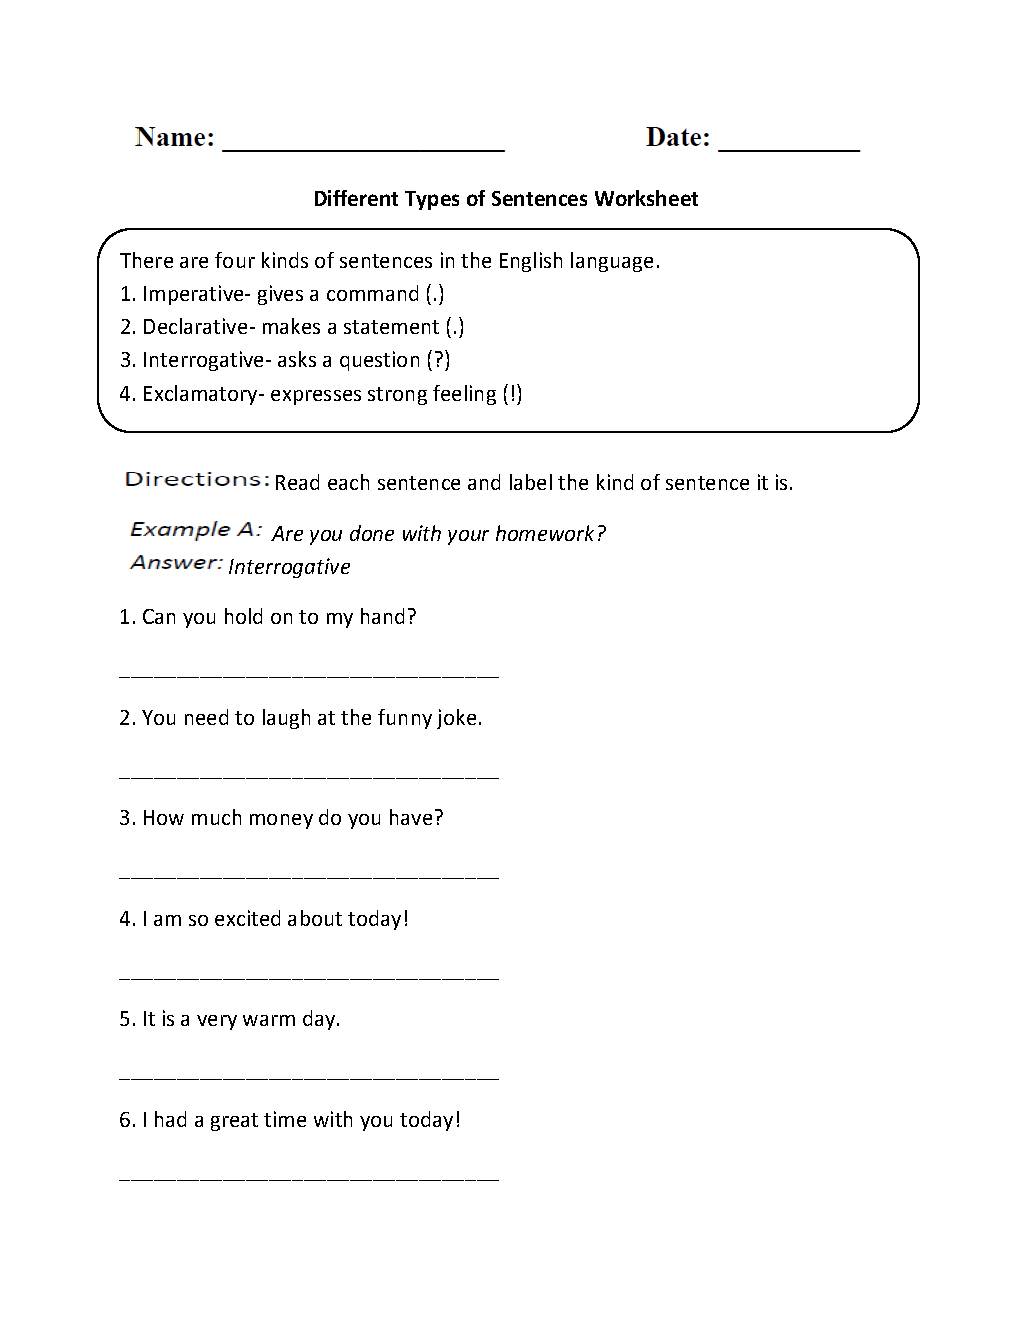 Sentences Worksheets | Types Of Sentences Worksheets | Free Printable Types Of Sentences Worksheets